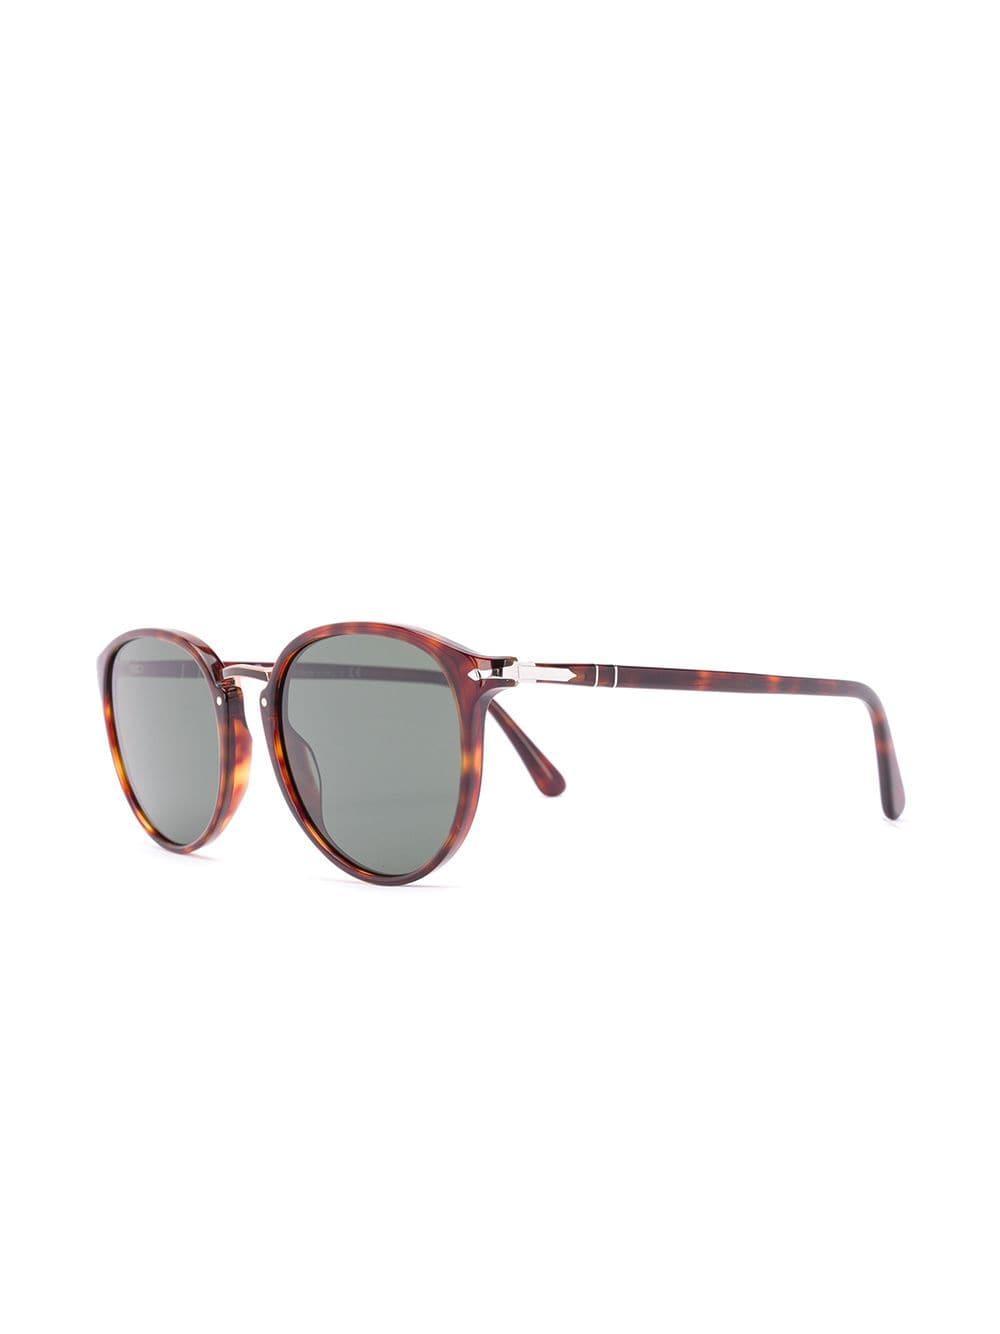 3ae3e846a5f50 Persol - Brown Round Frame Sunglasses - Lyst. View fullscreen